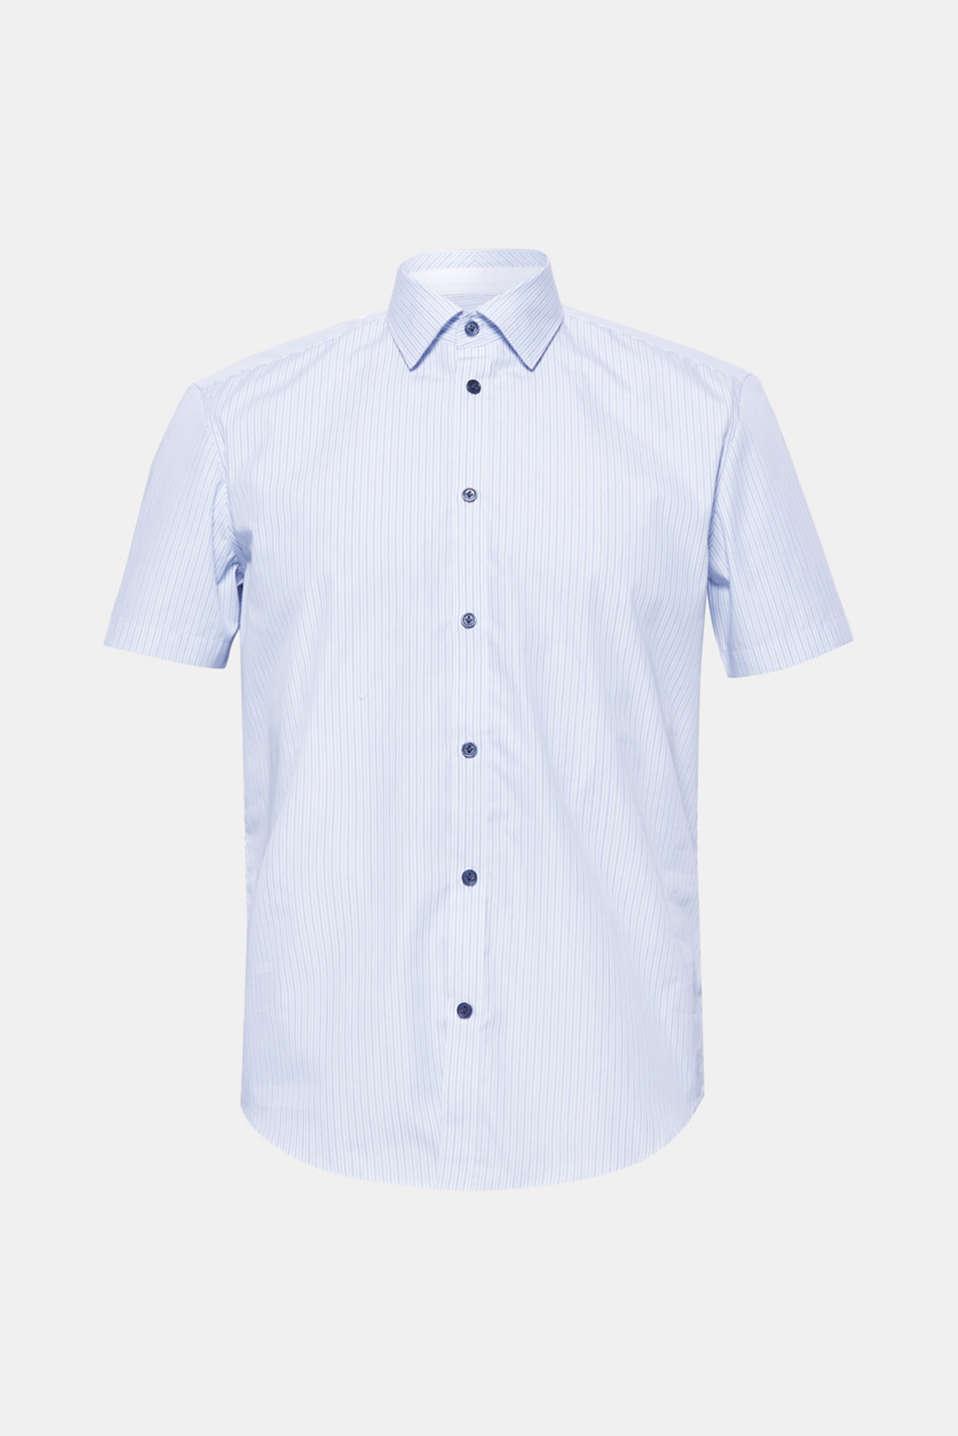 Shirts woven Regular fit, LIGHT BLUE, detail image number 5